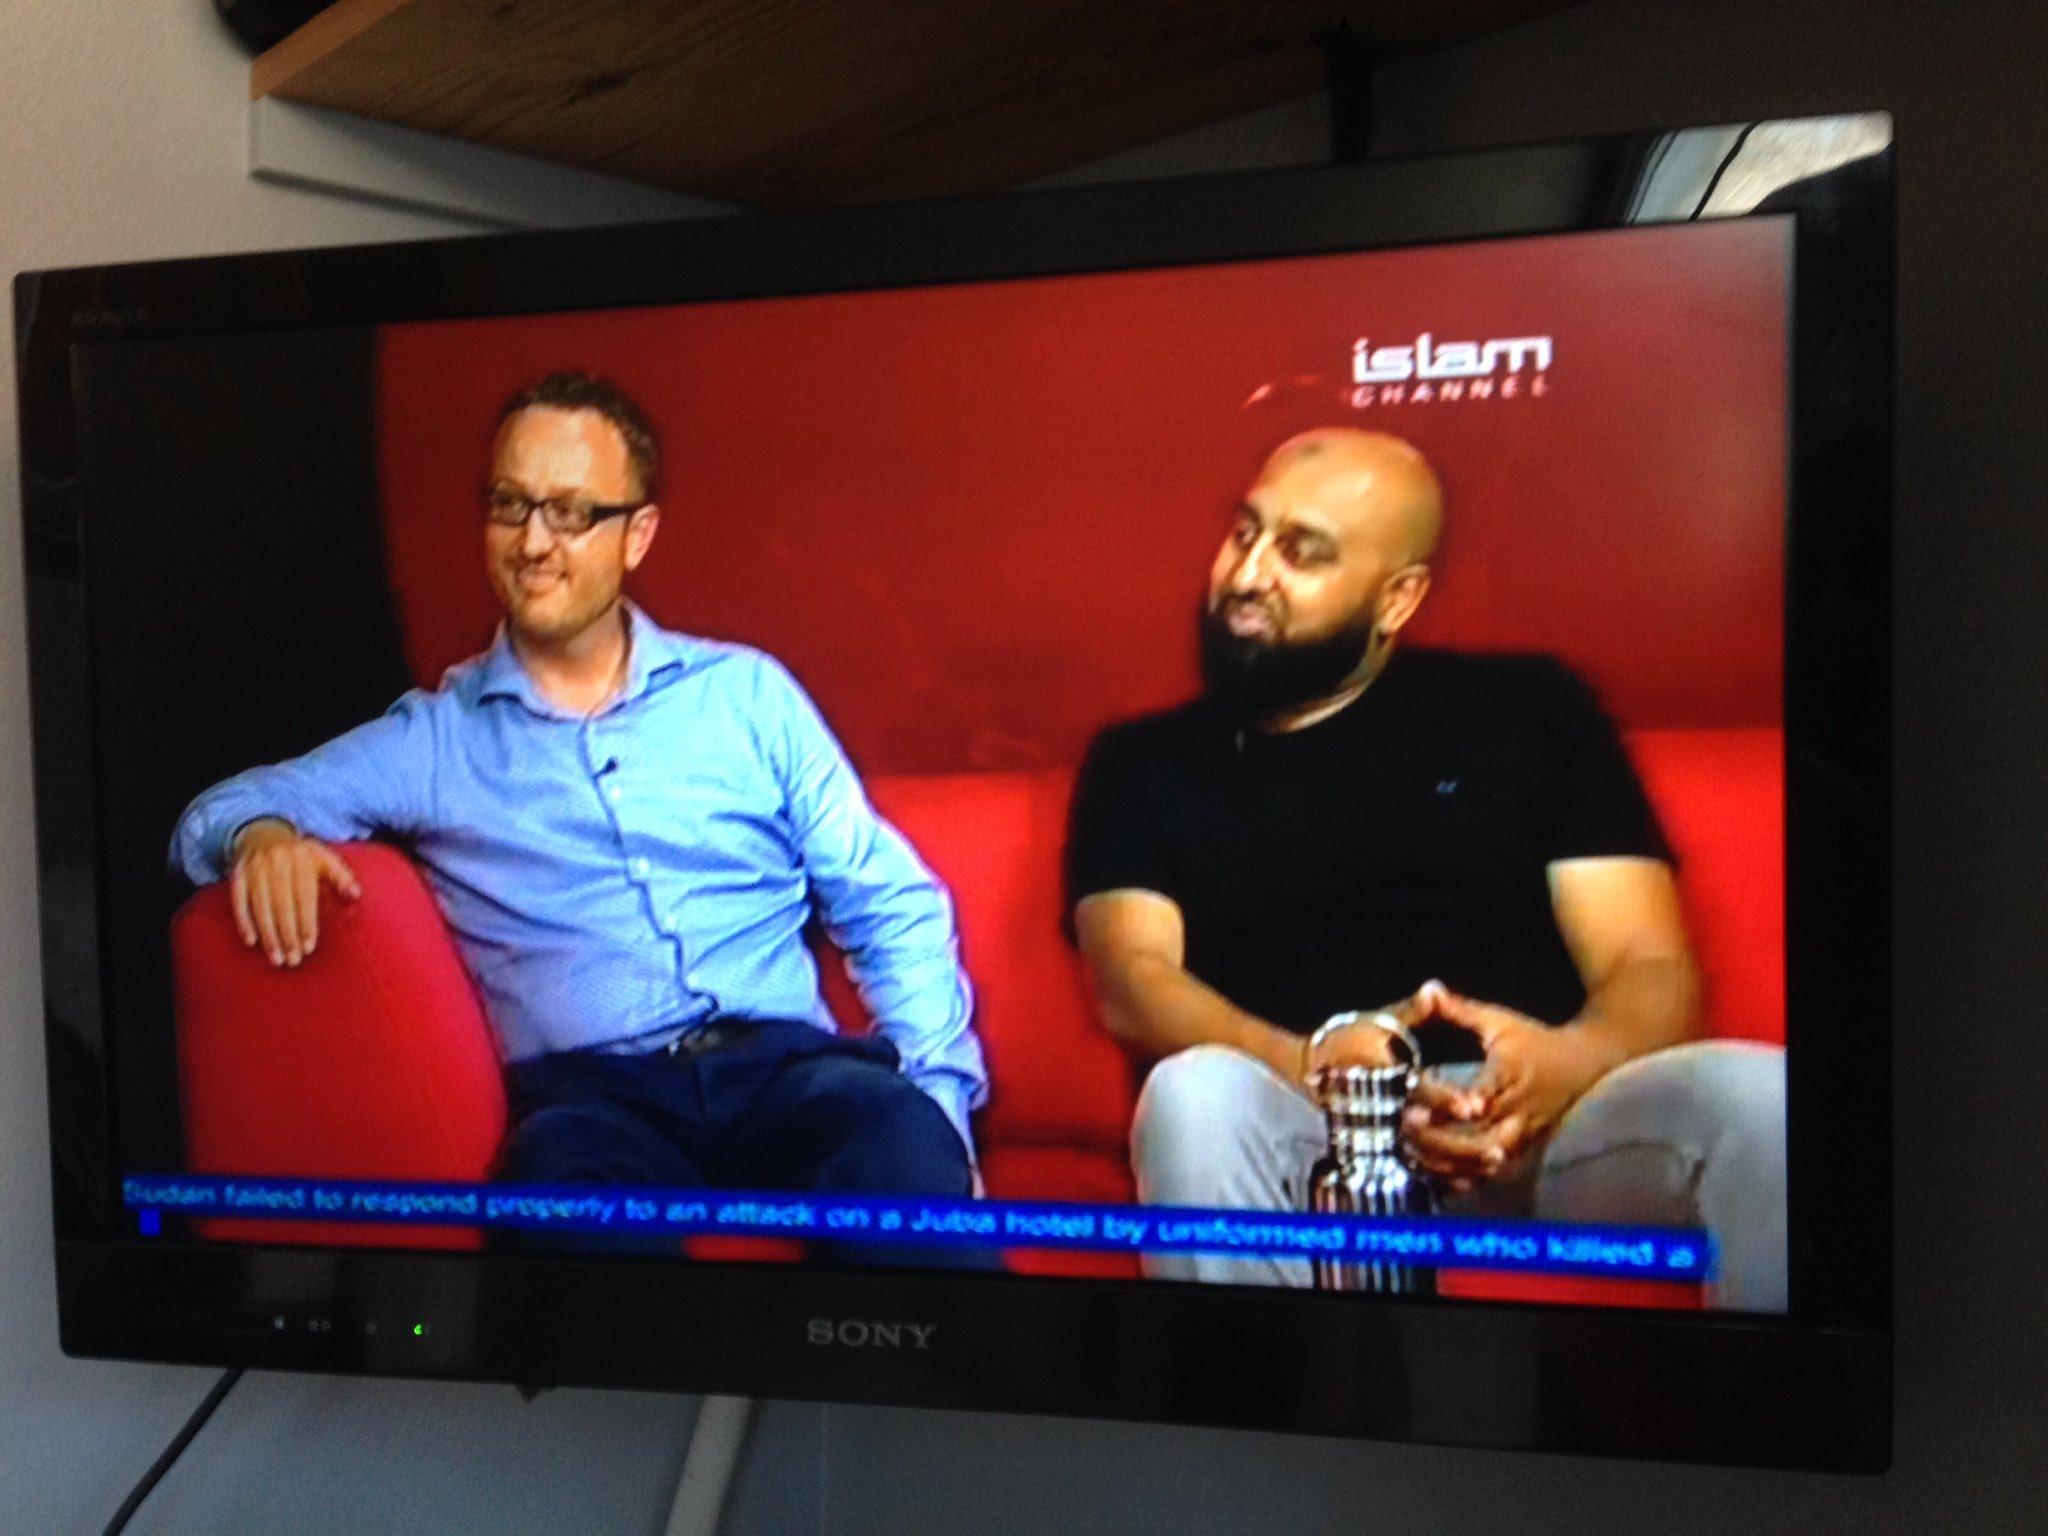 Tobias and Harun on TV